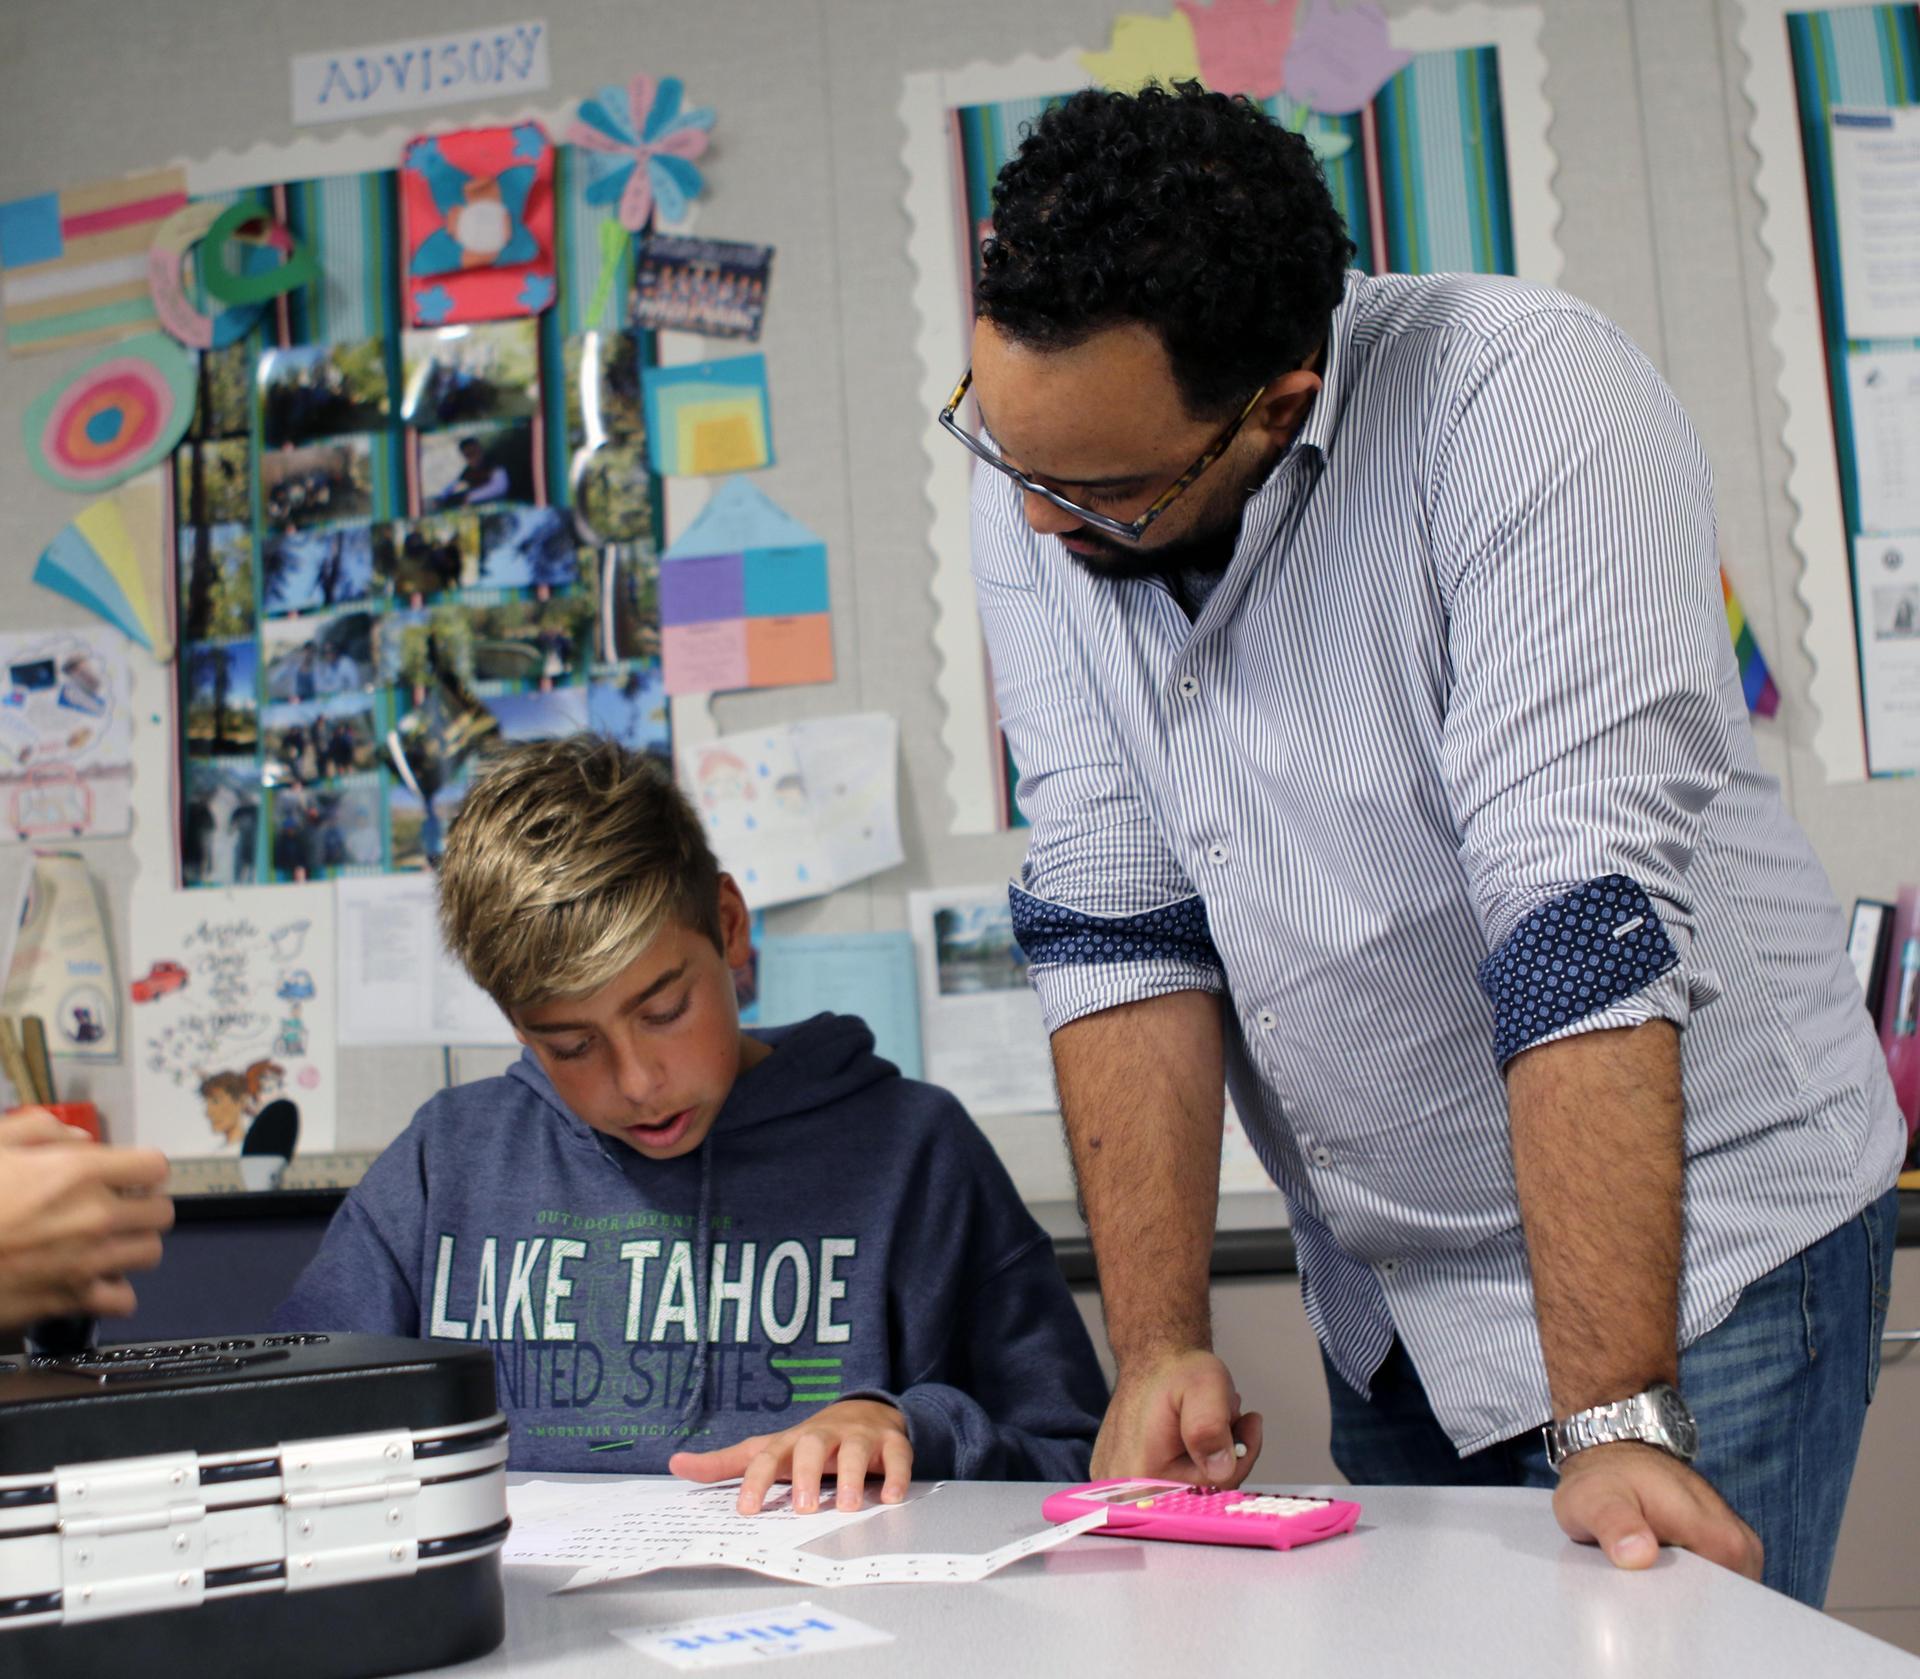 Mr. 布兰切特和他的一个数学学生一起工作.